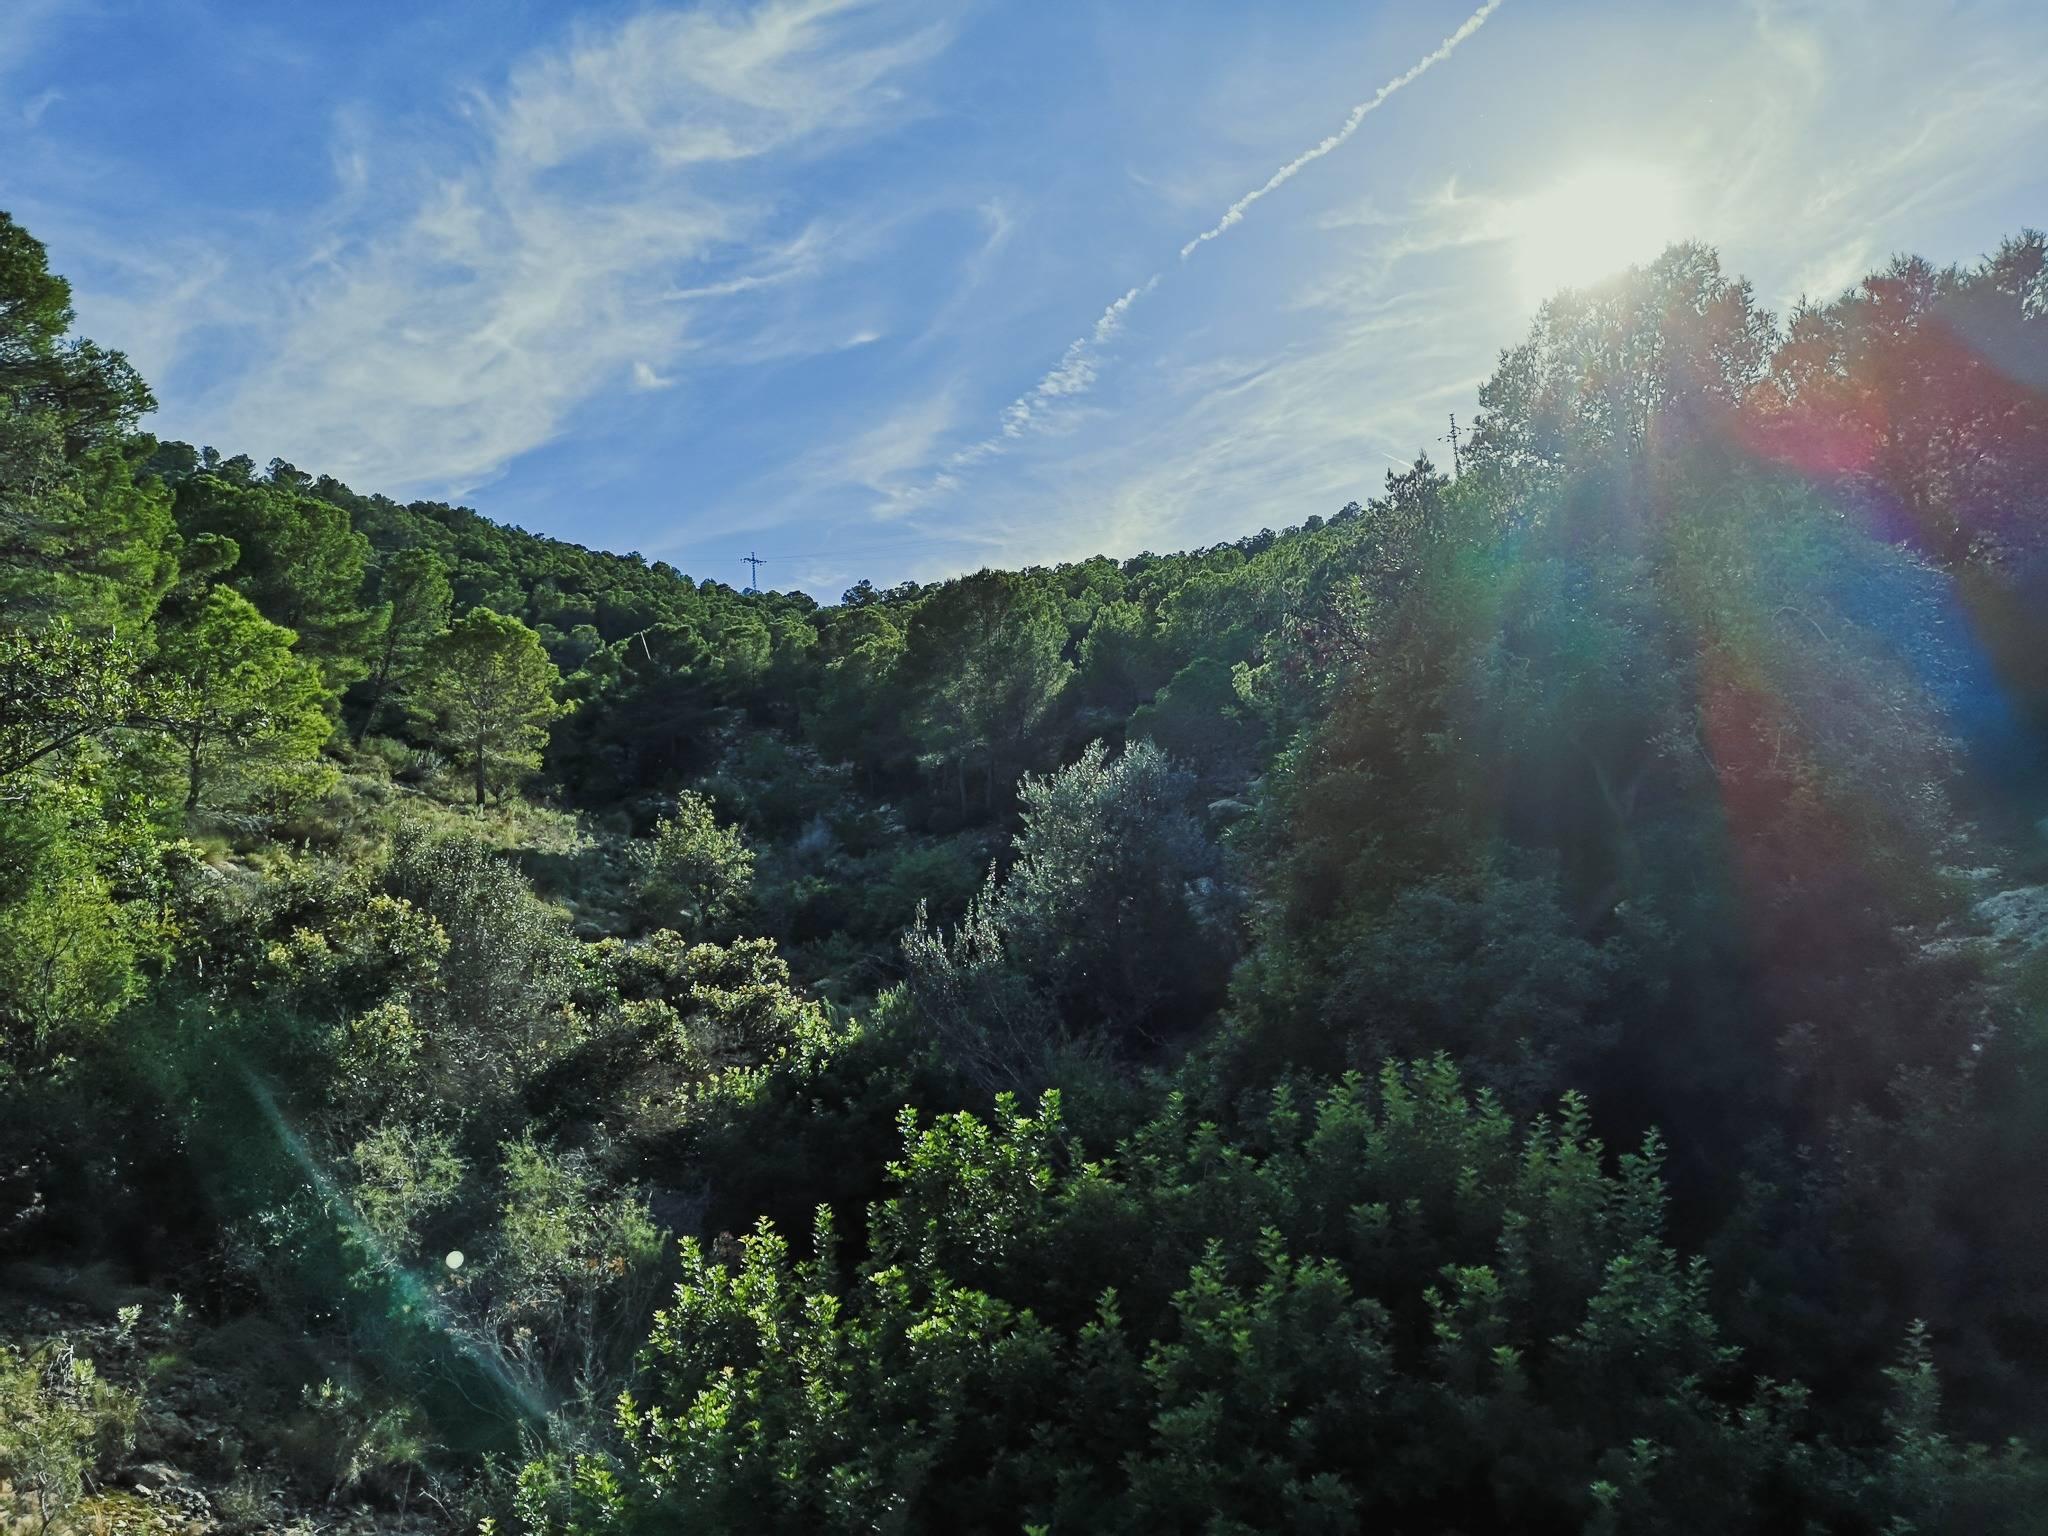 Flora in Camino del Faro, Serra Gelada, Spain. [CC BY-SA 4.0], via Connecting the Dots